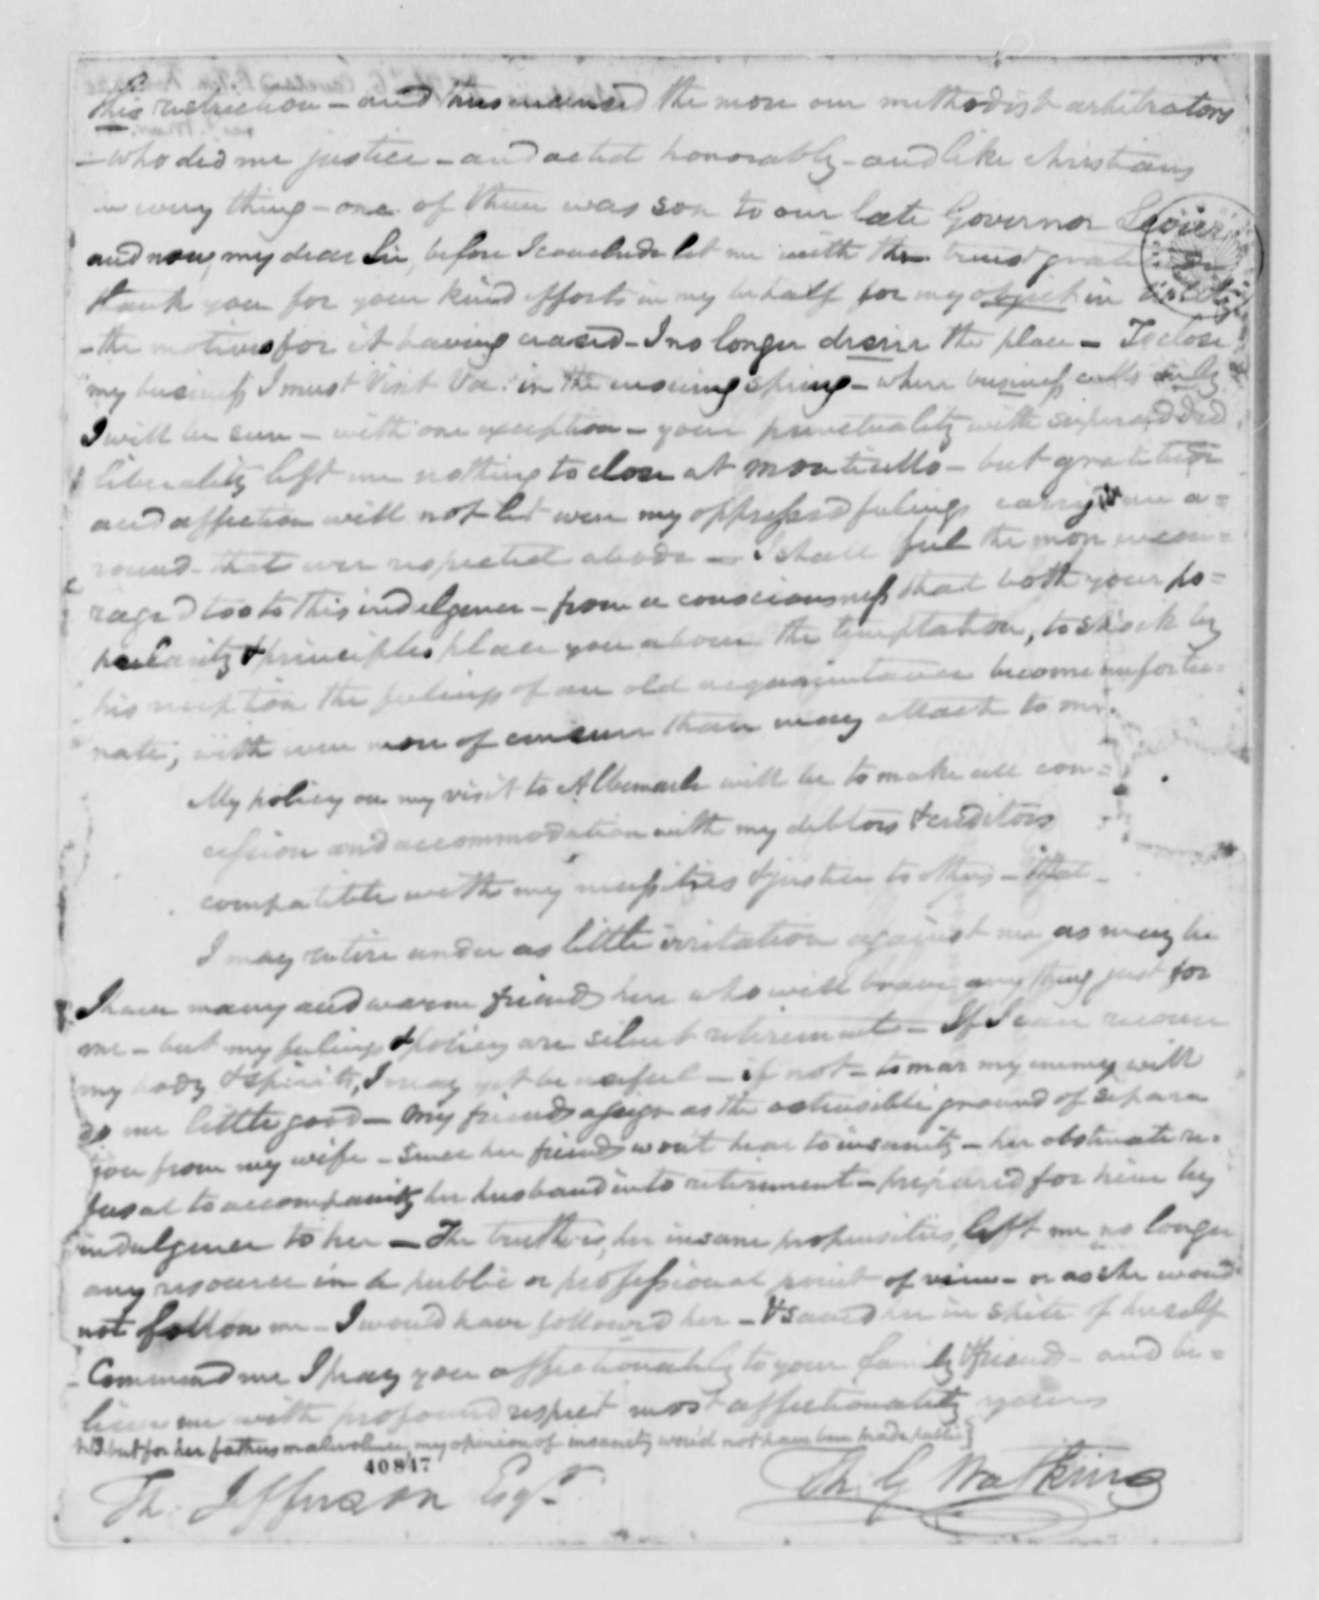 Thomas G. Watkins to Thomas Jefferson, February 12, 1825